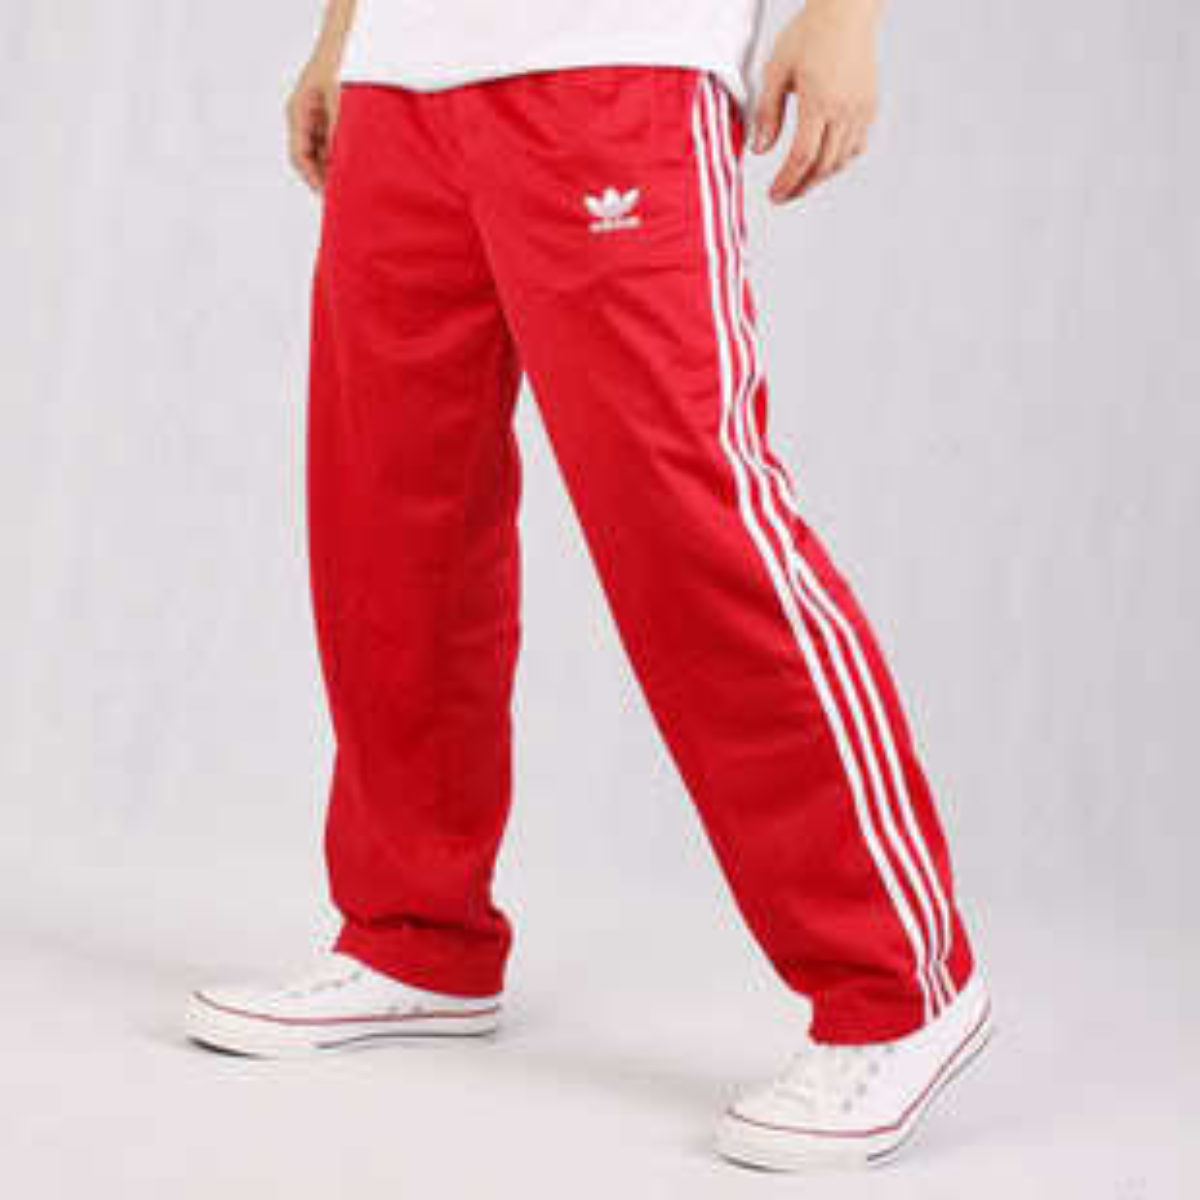 mostaza Describir único  Pantalones Adidas - Modaellos.com